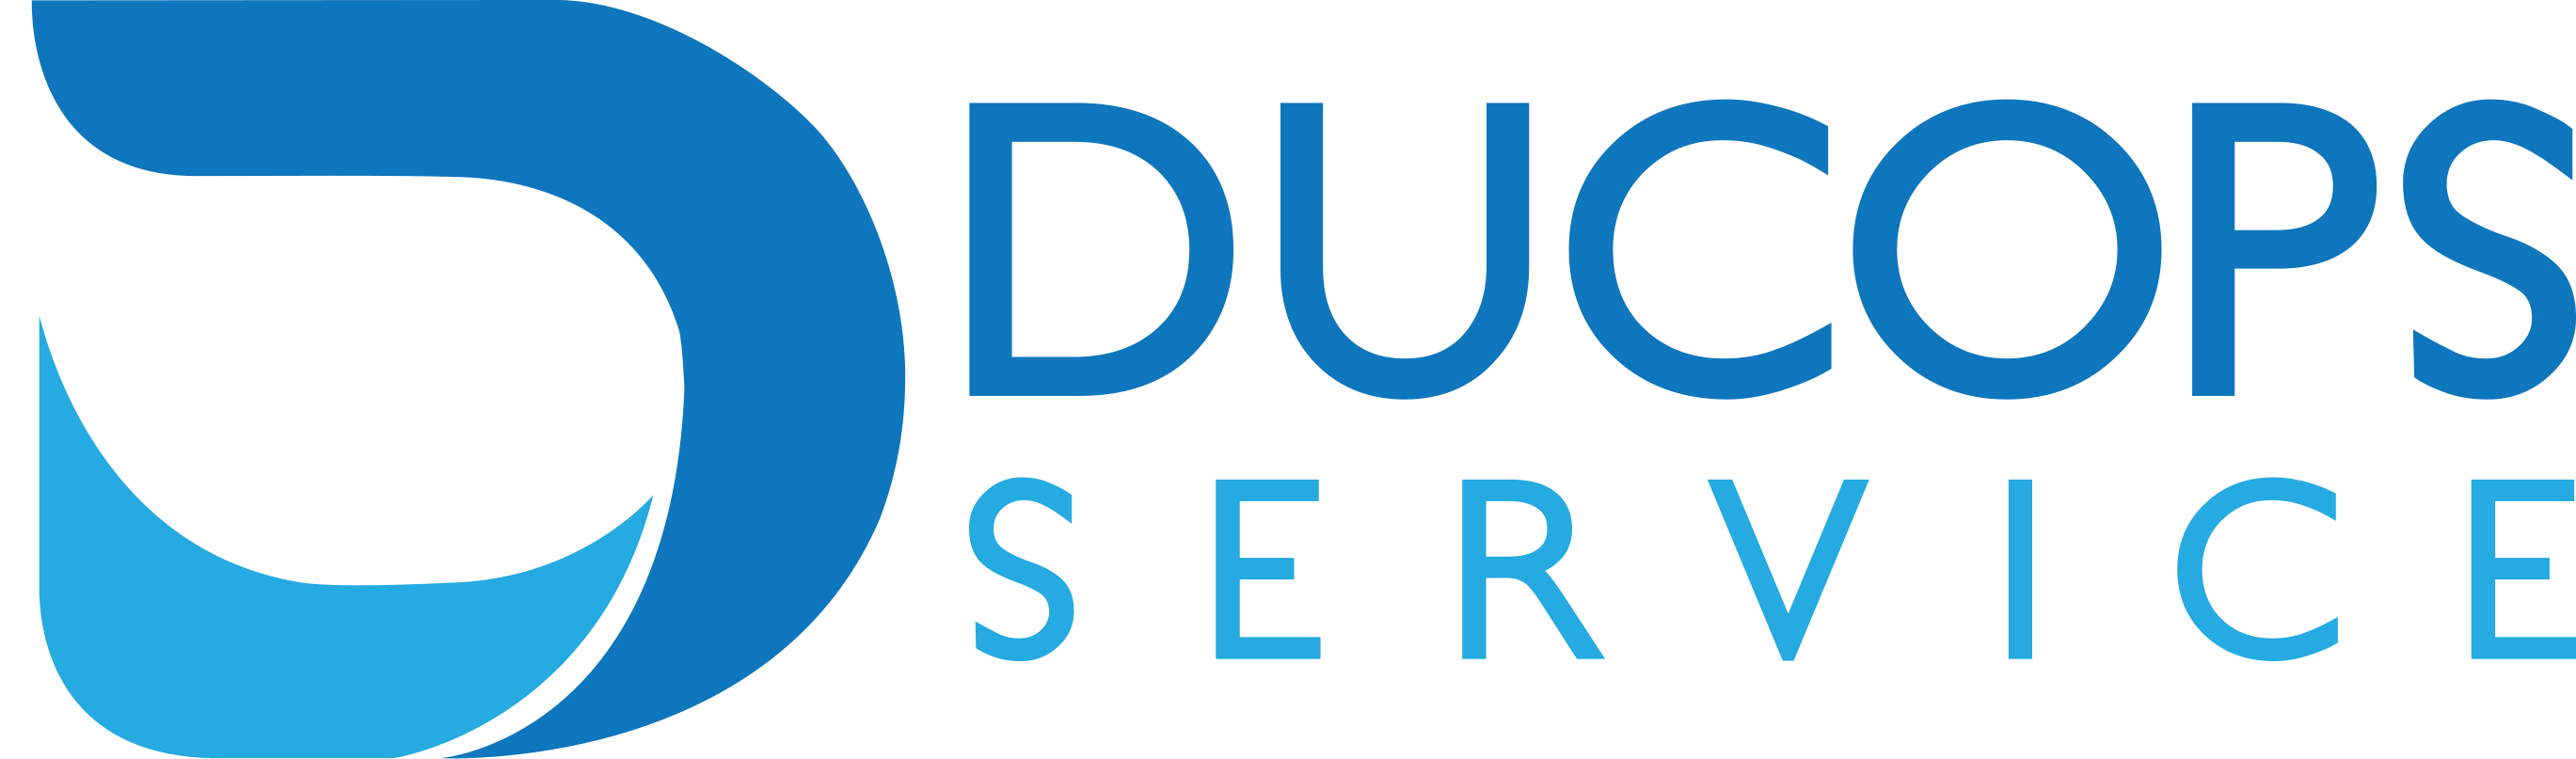 Ducops-logo